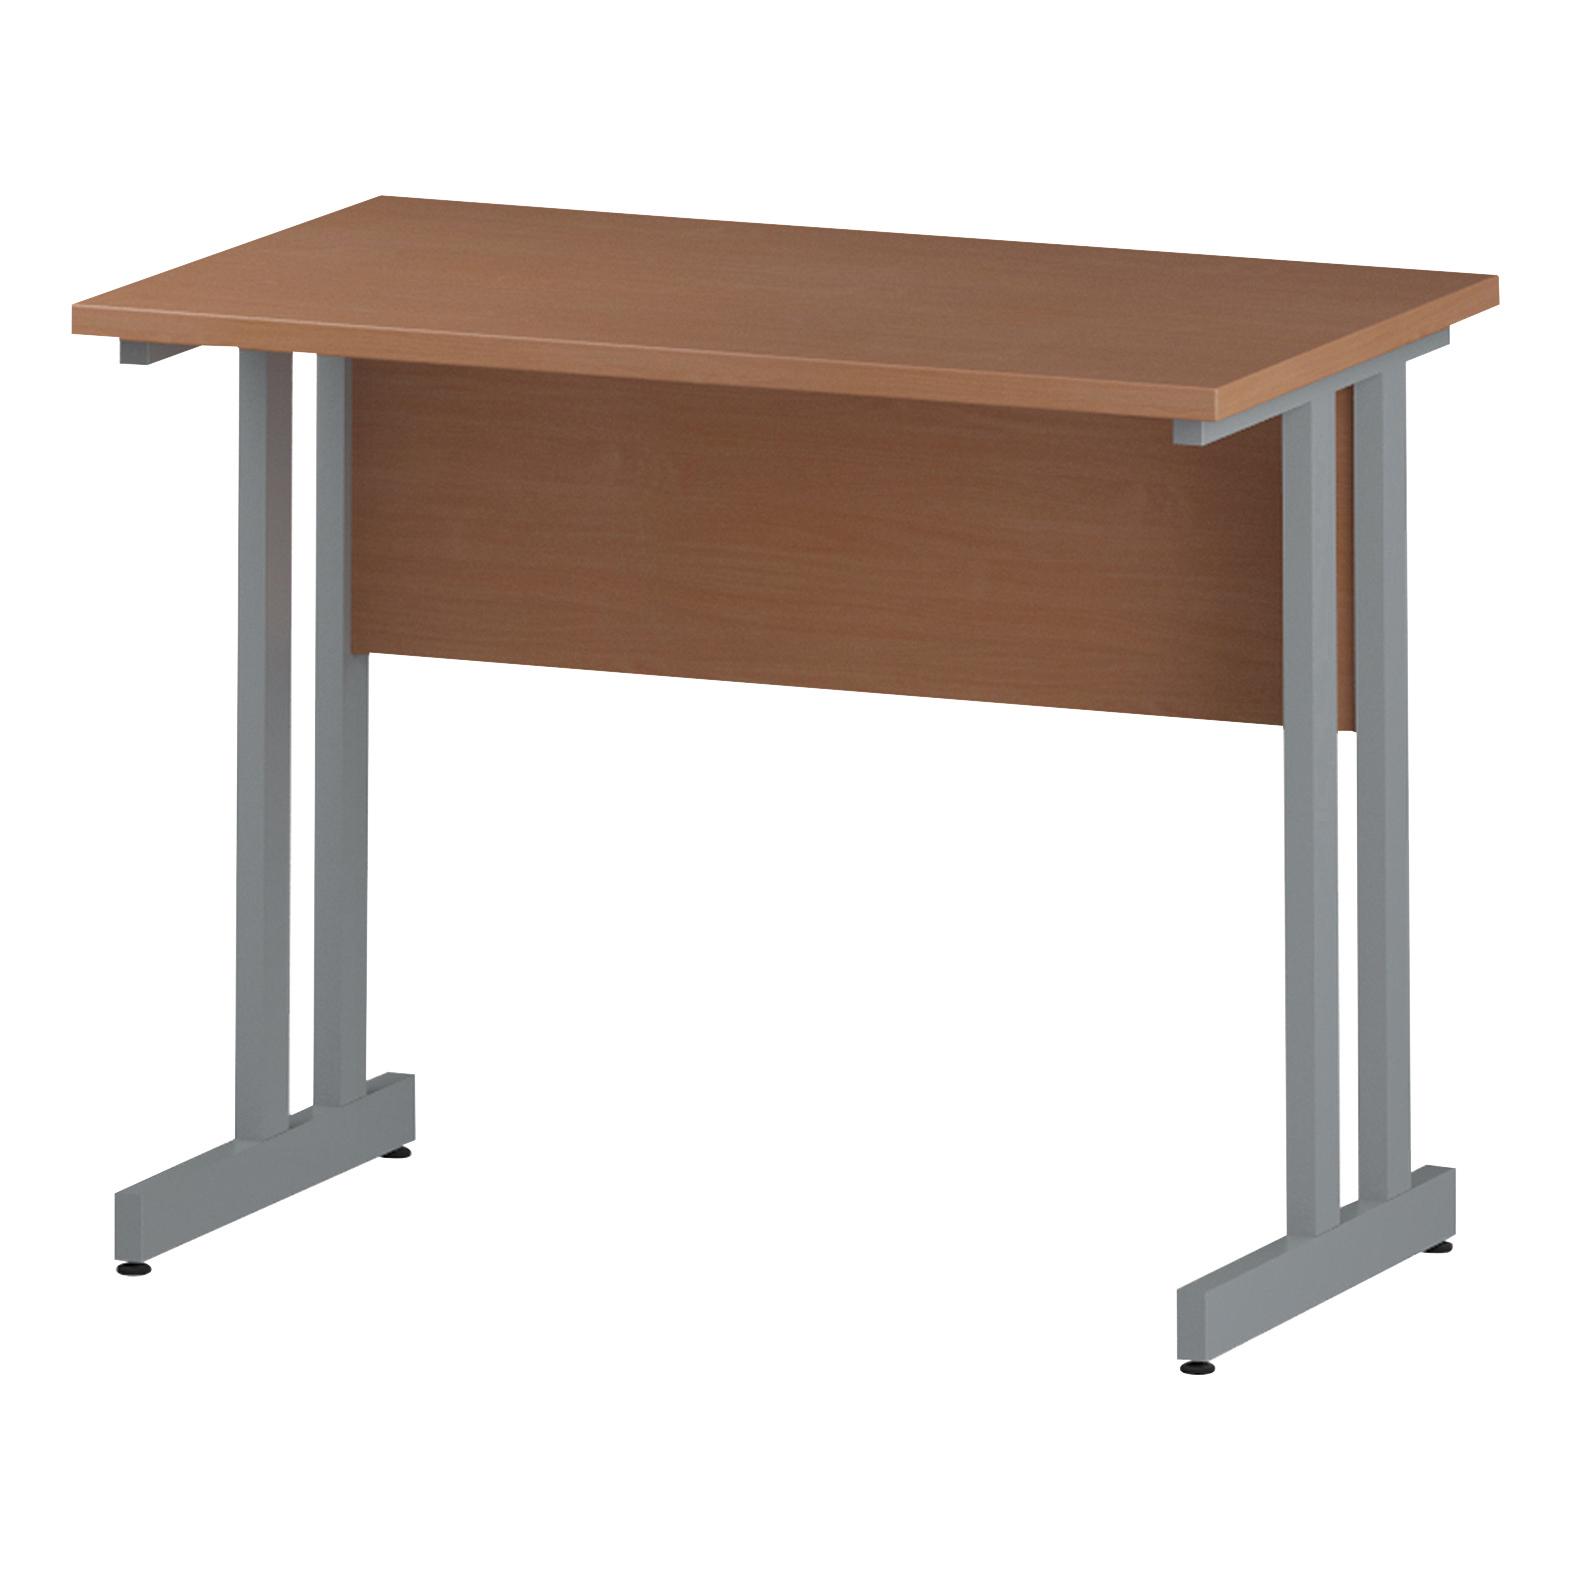 Trexus Rectangular Slim Desk Silver Cantilever Leg 1000x600mm Beech Ref I001678